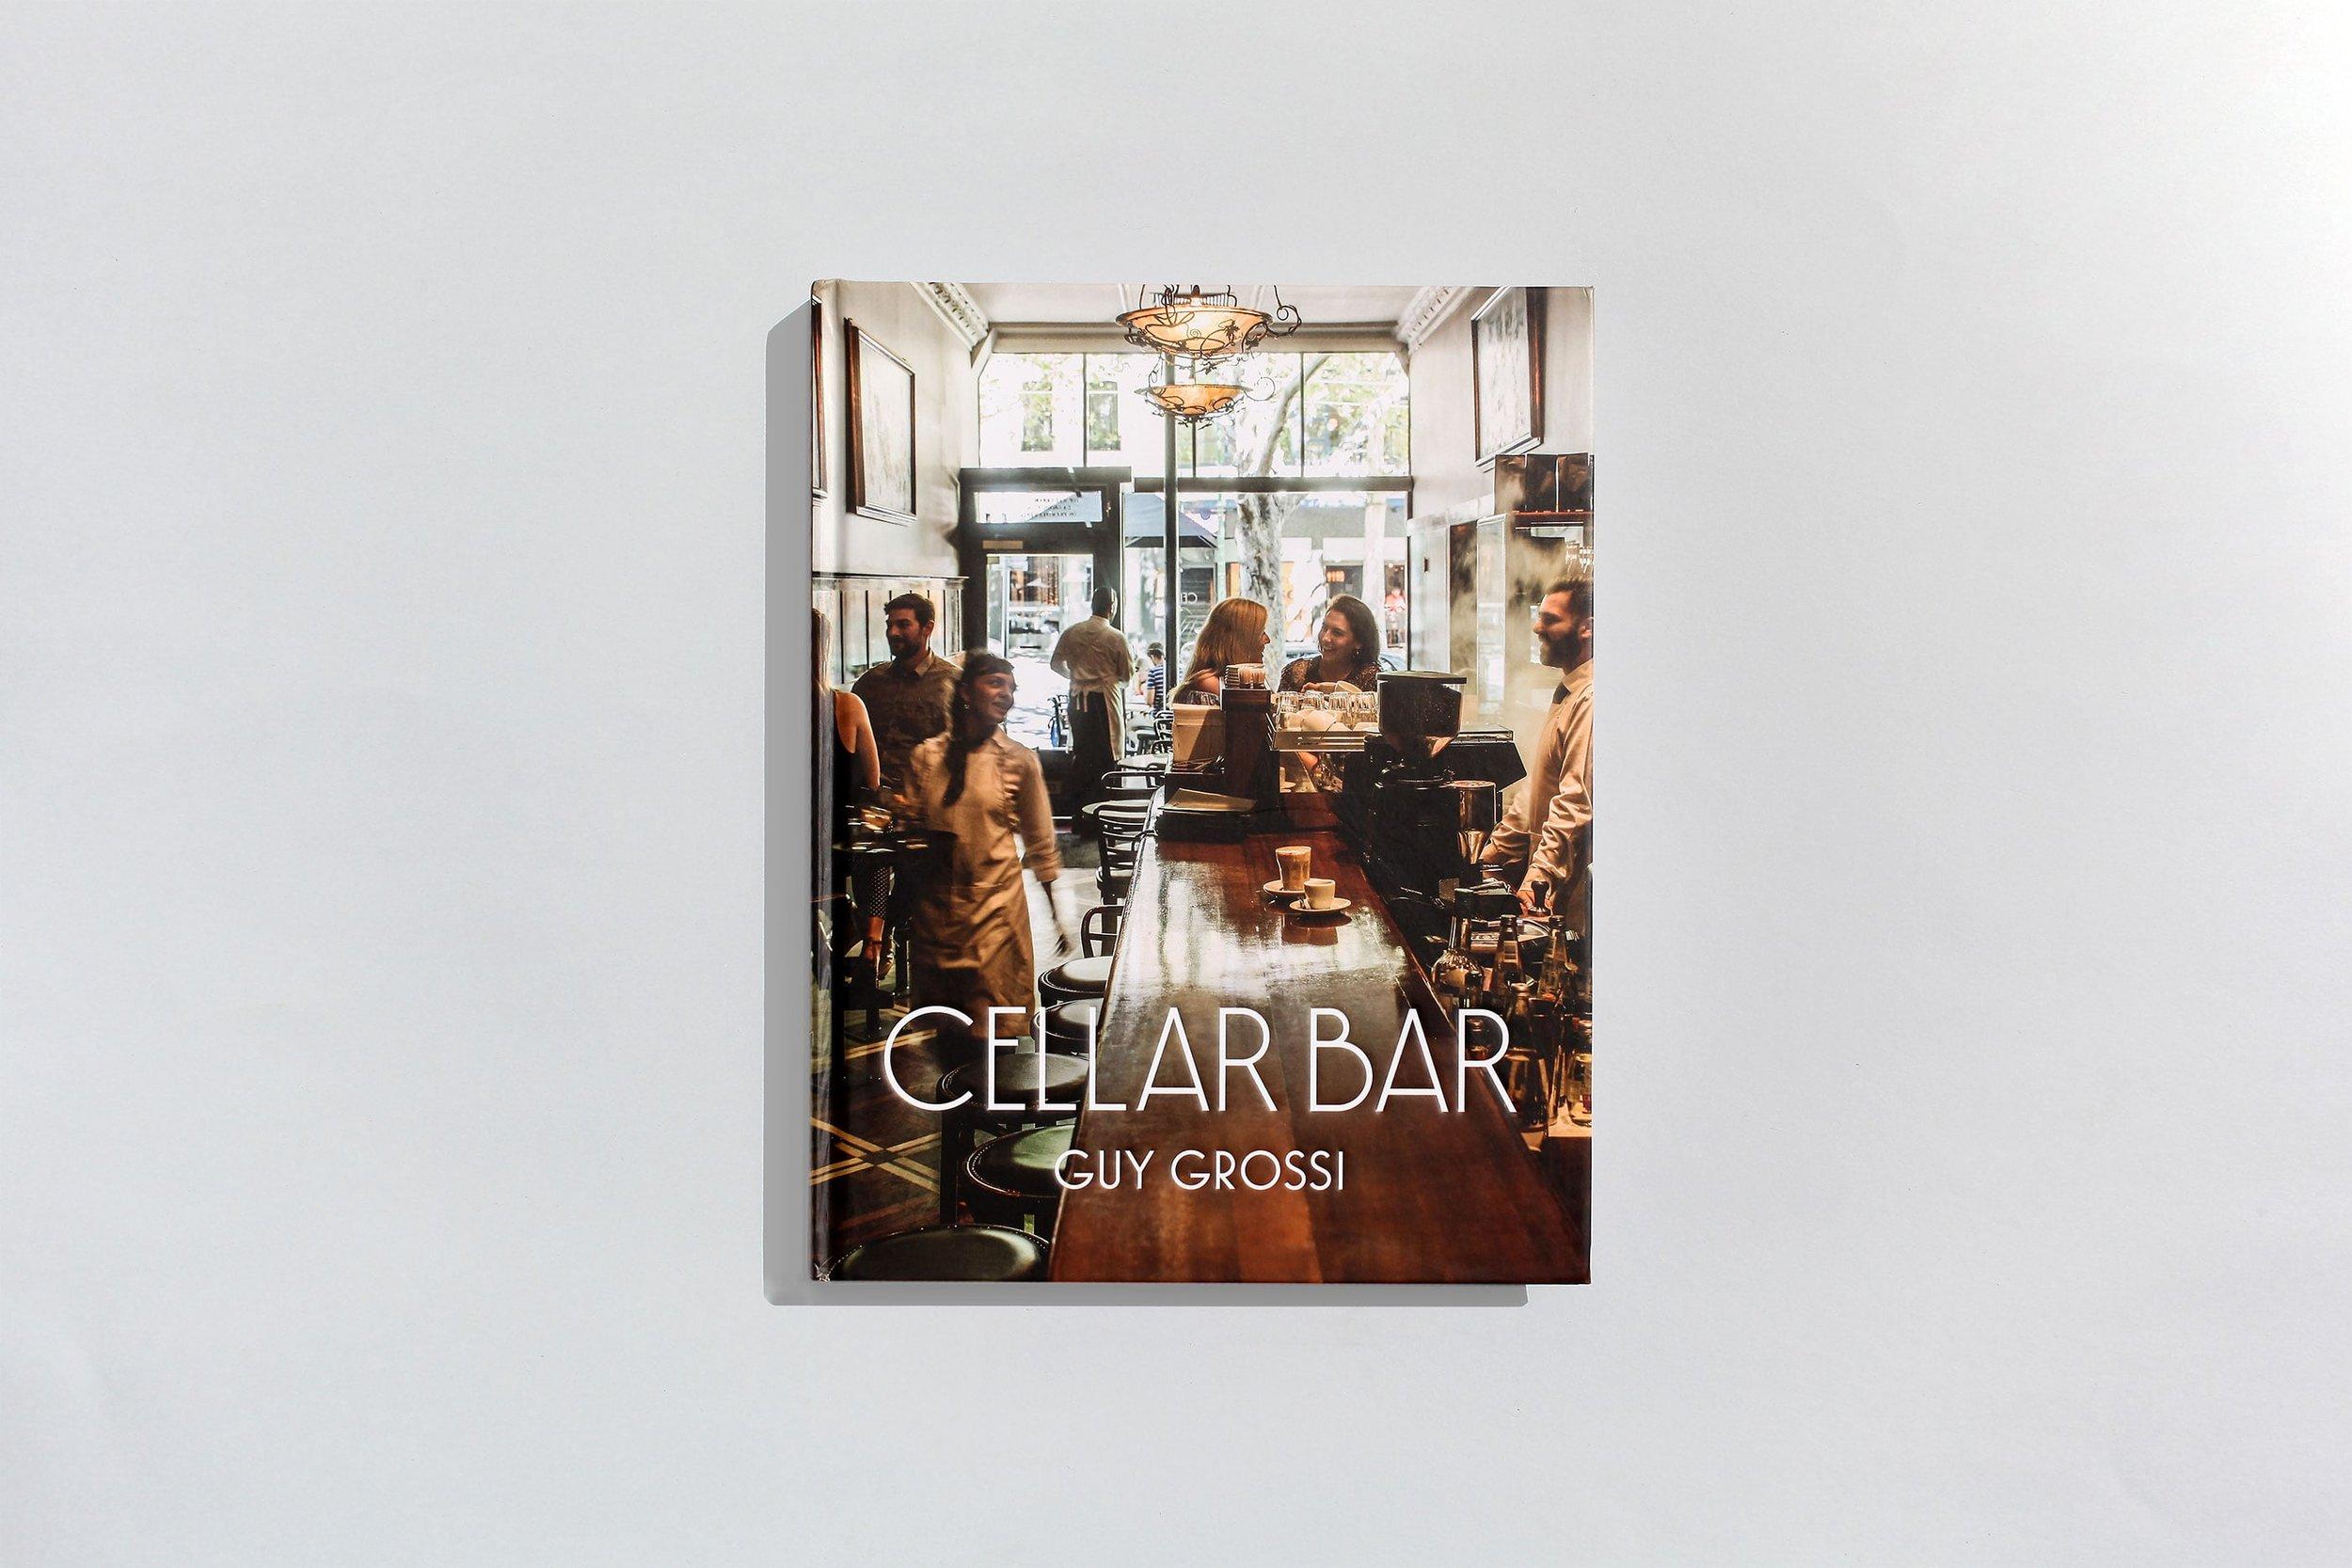 Title – Cellar Bar Author – Guy Grossi Designer – Daniel New Photographers – Mark Chew Stylist – Deb Kaloper Publisher – Penguin Random House